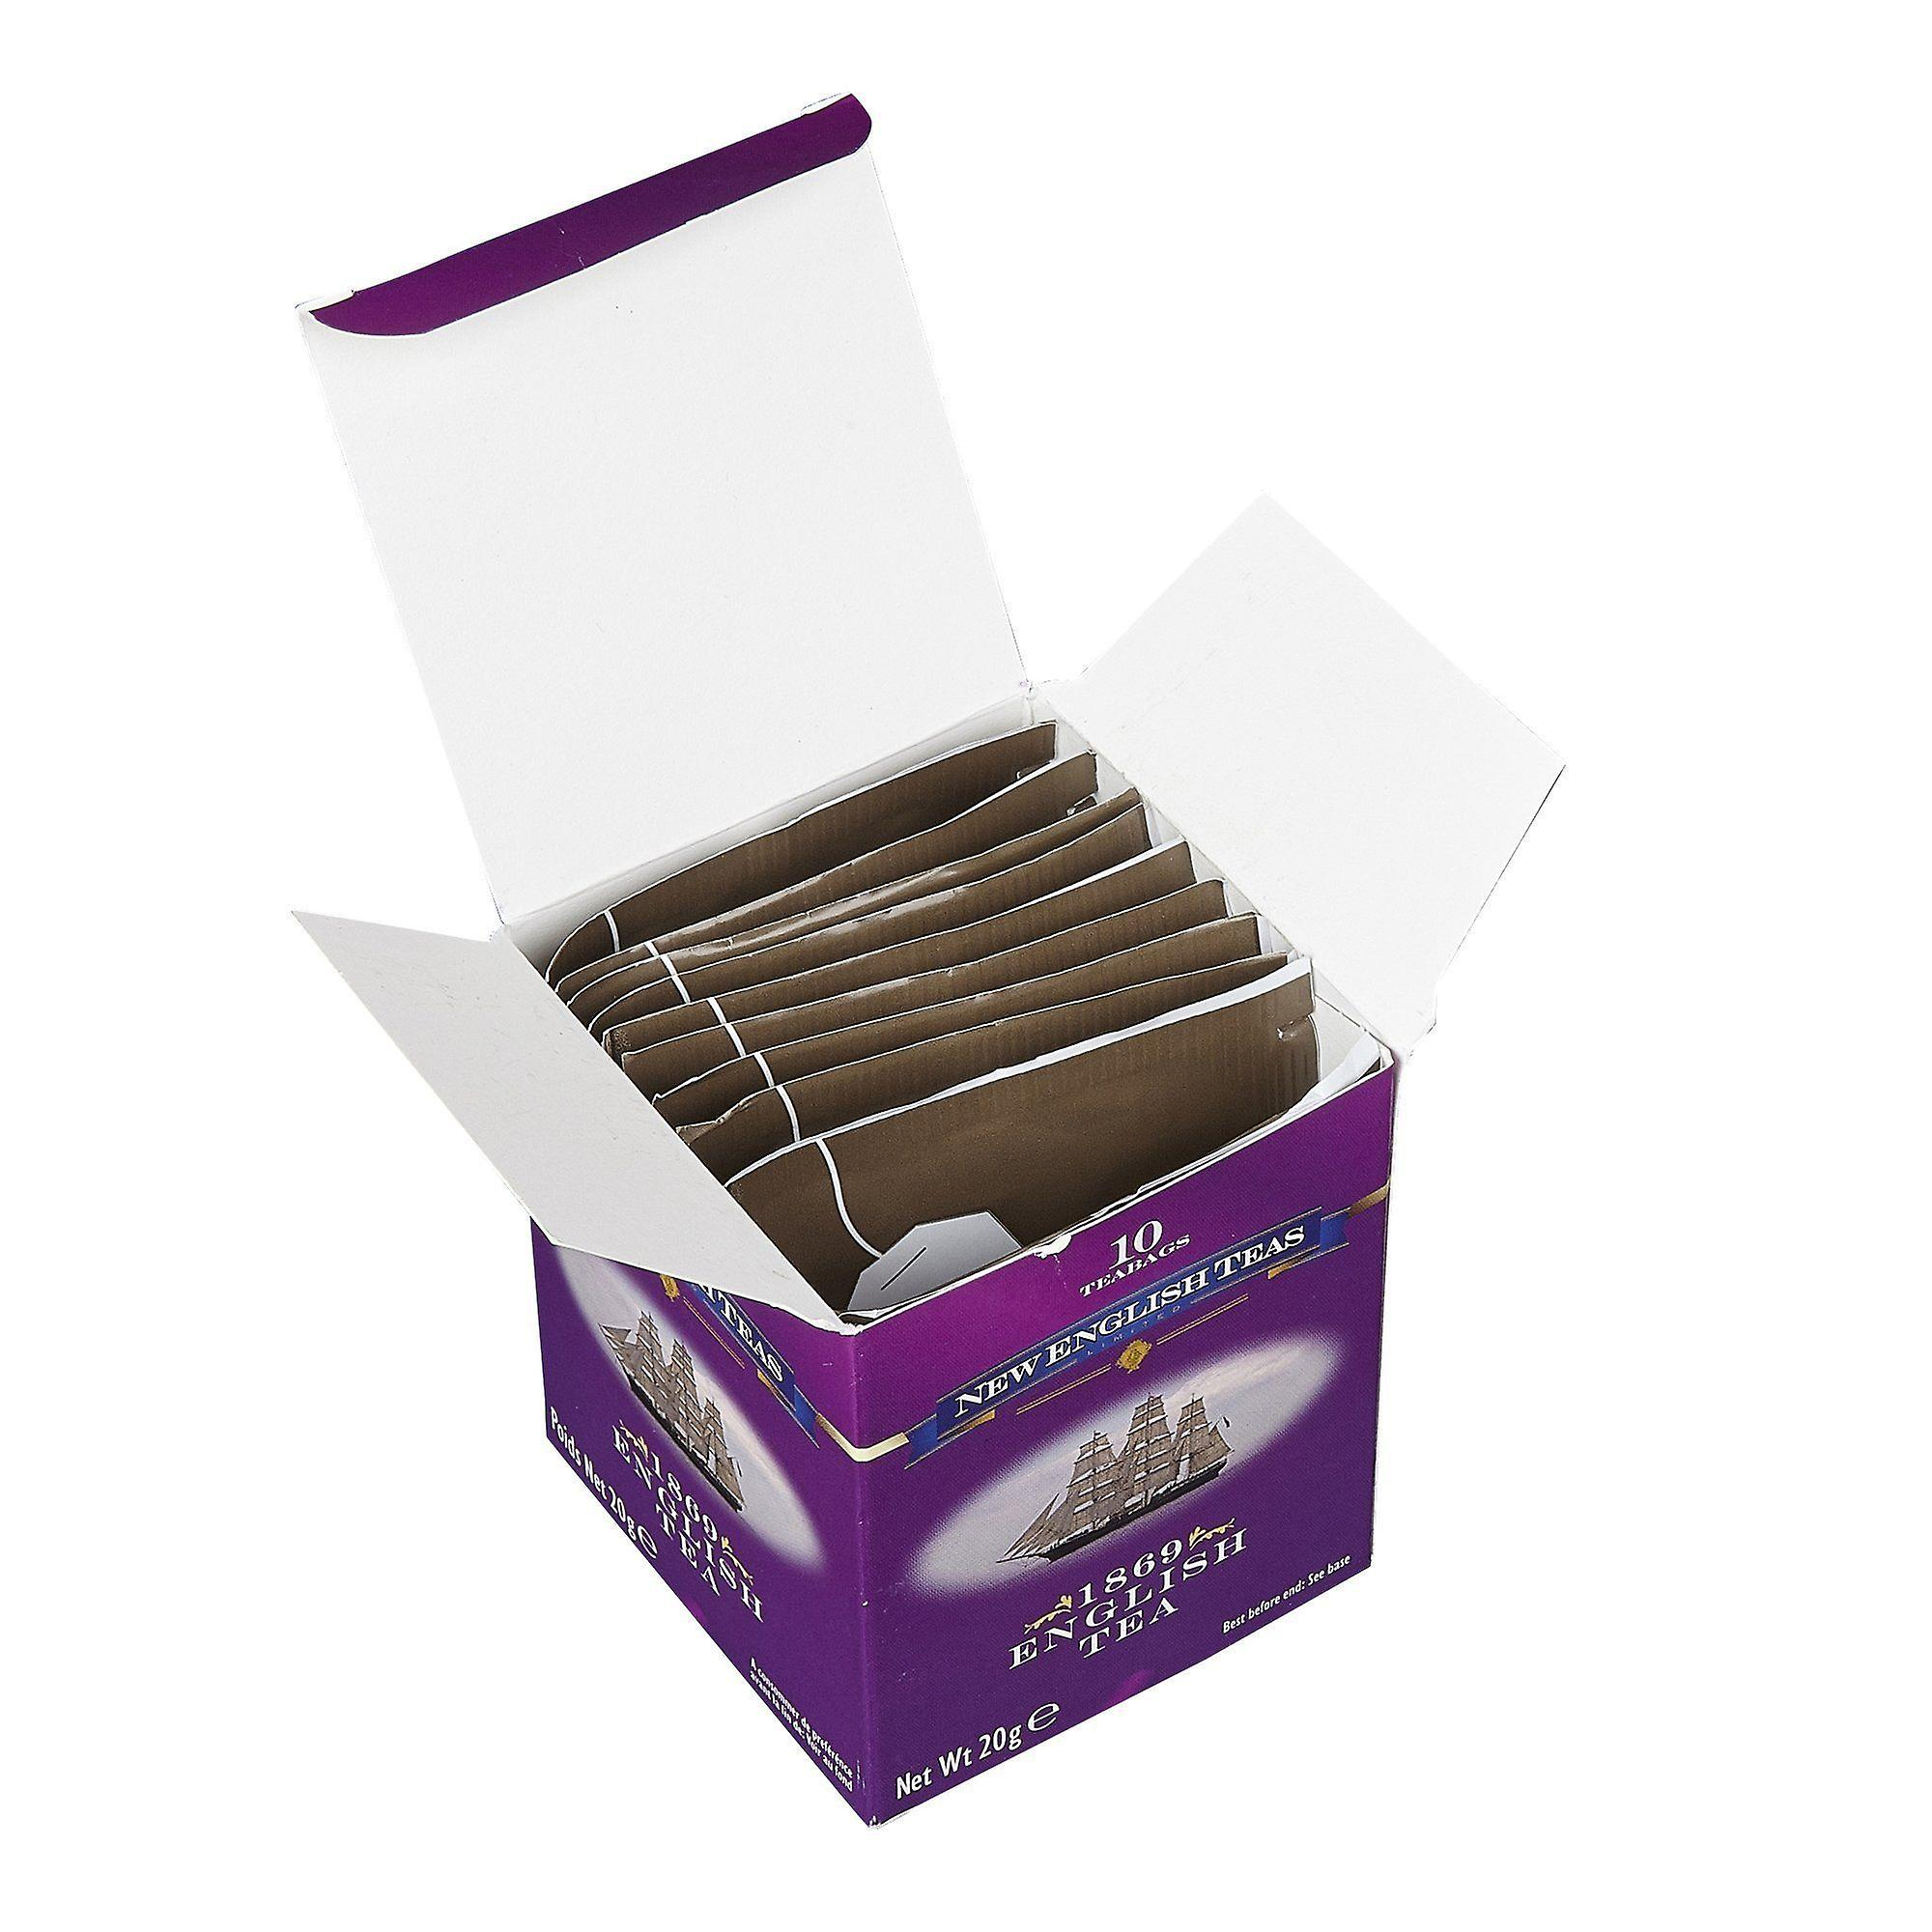 Classic 1869 english tea 10 individually wrapped teabags